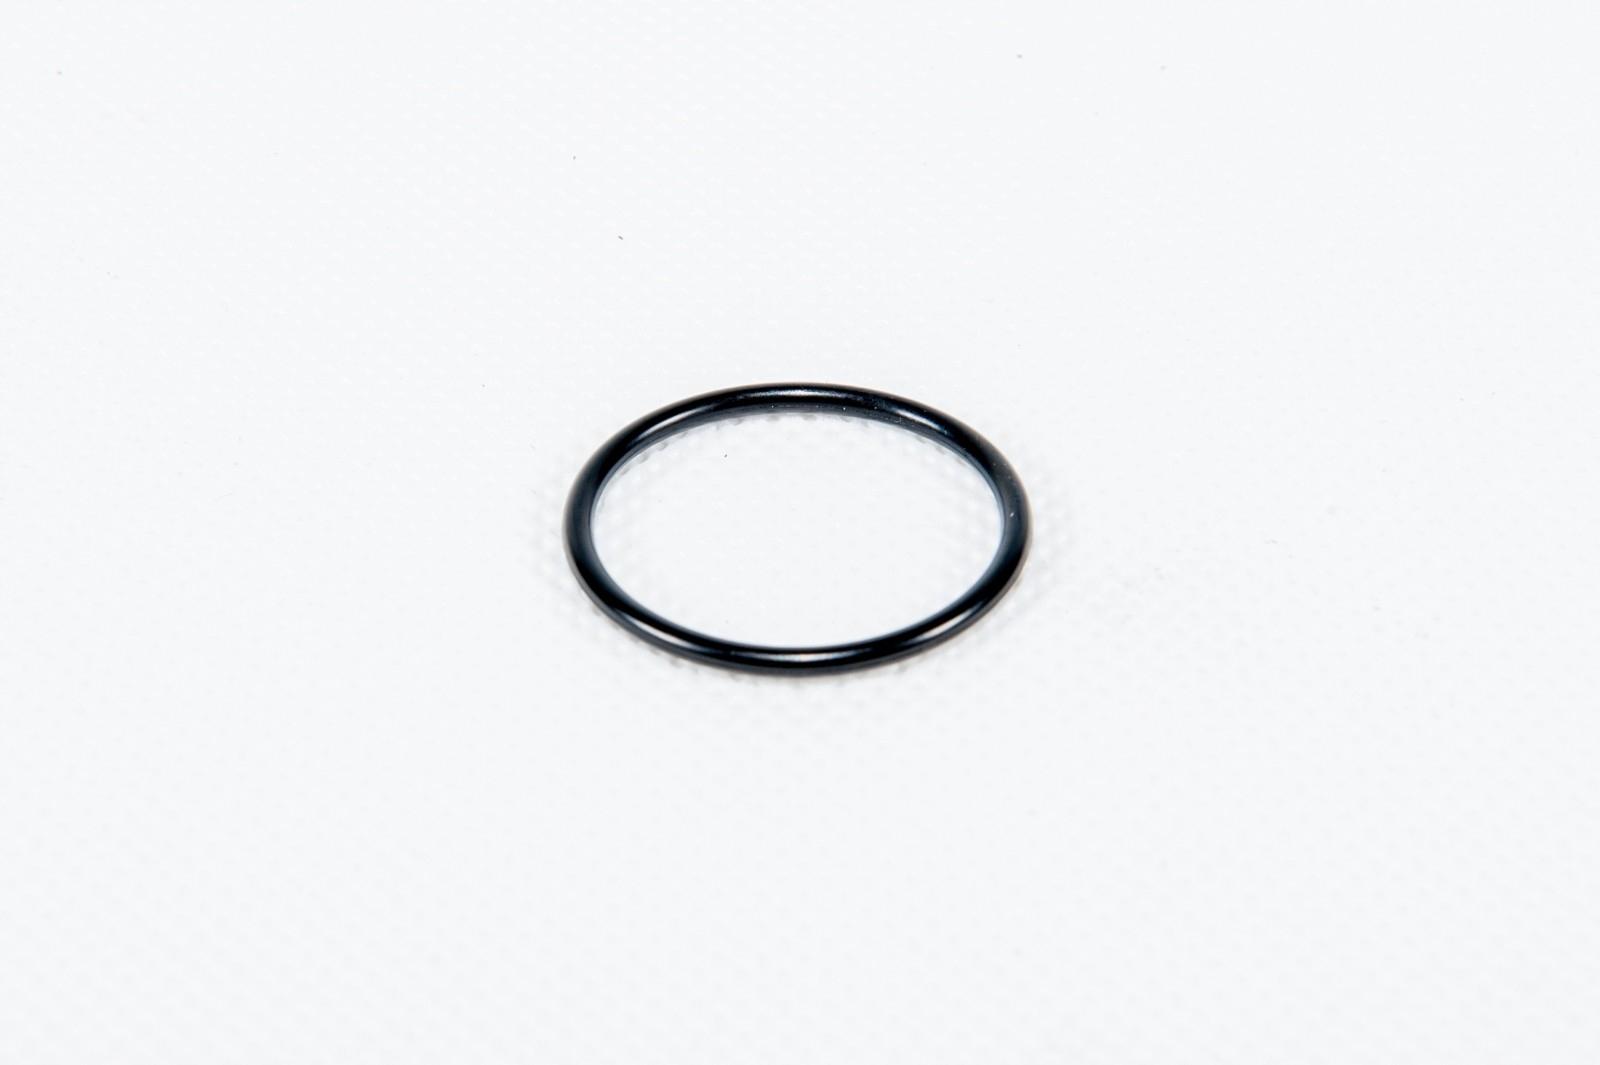 Oring obudowy rozrządu Subaru Legacy H6 OEM 806925100